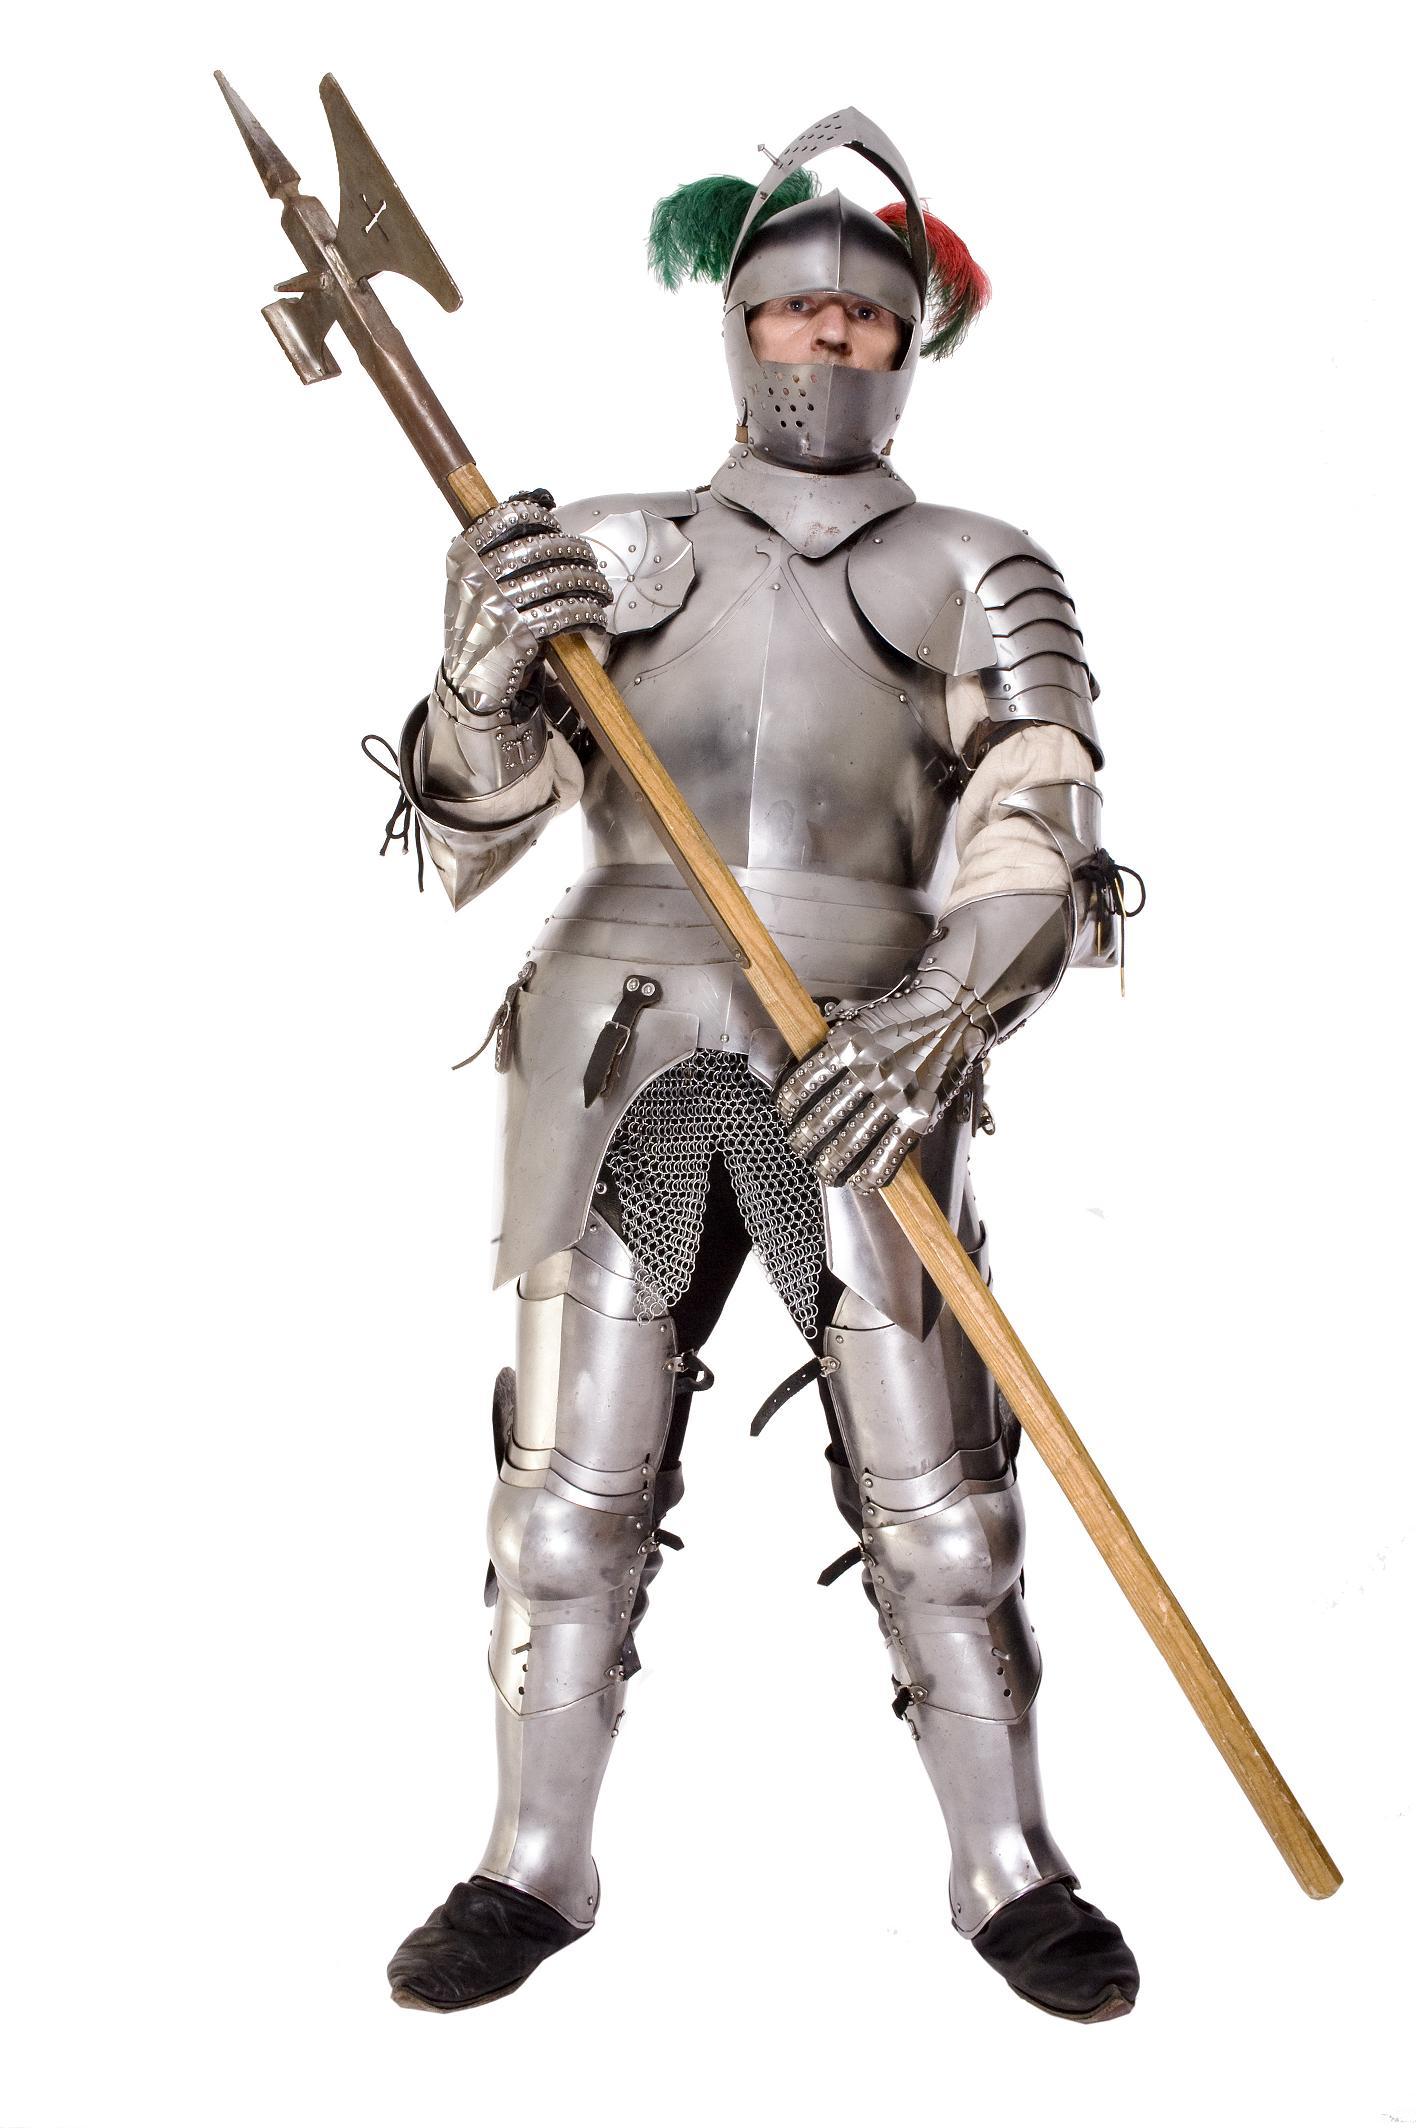 more armor slots